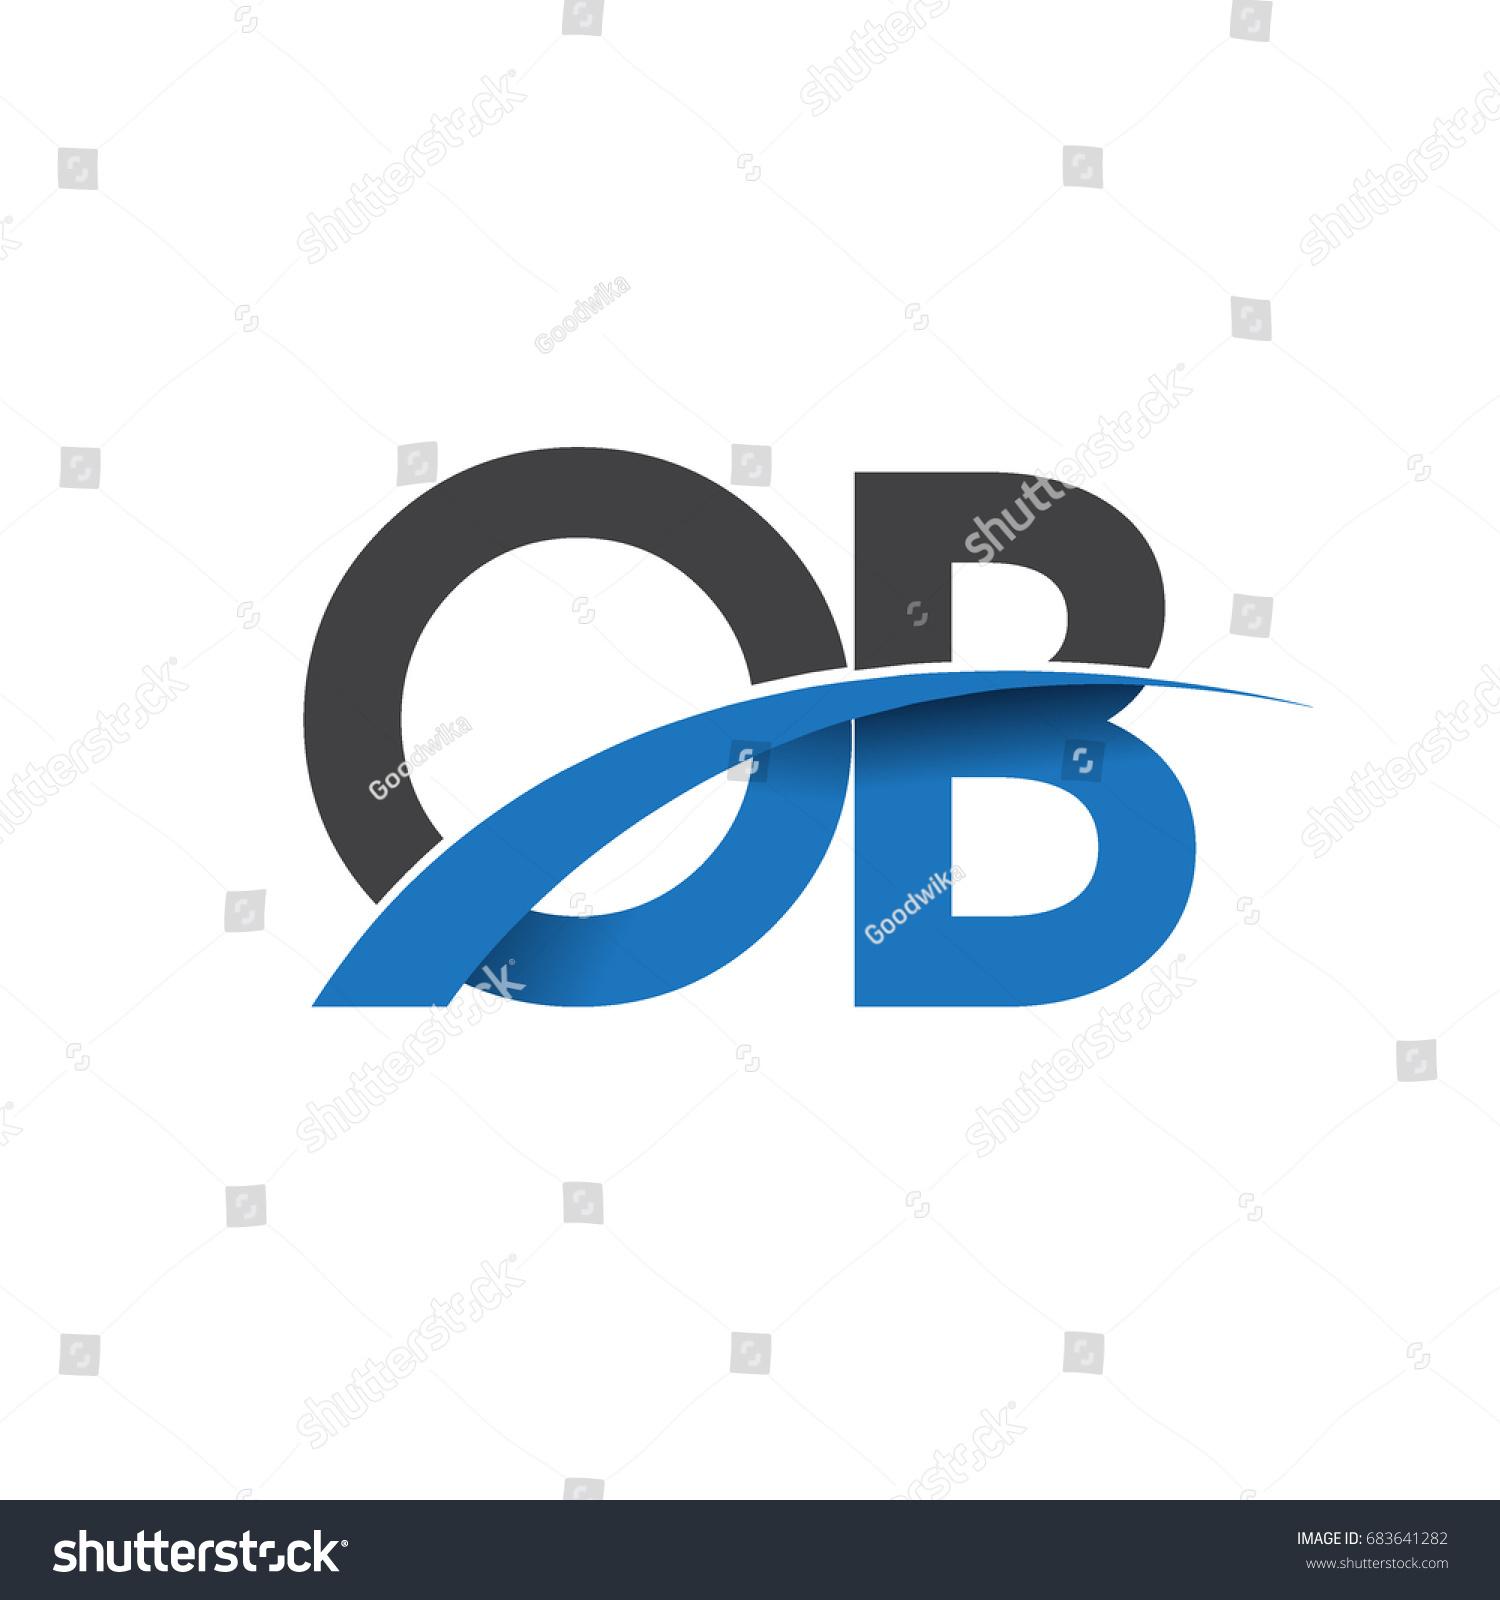 Initial letter ob logotype company name stock vector 683641282 initial letter ob logotype company name stock vector 683641282 shutterstock buycottarizona